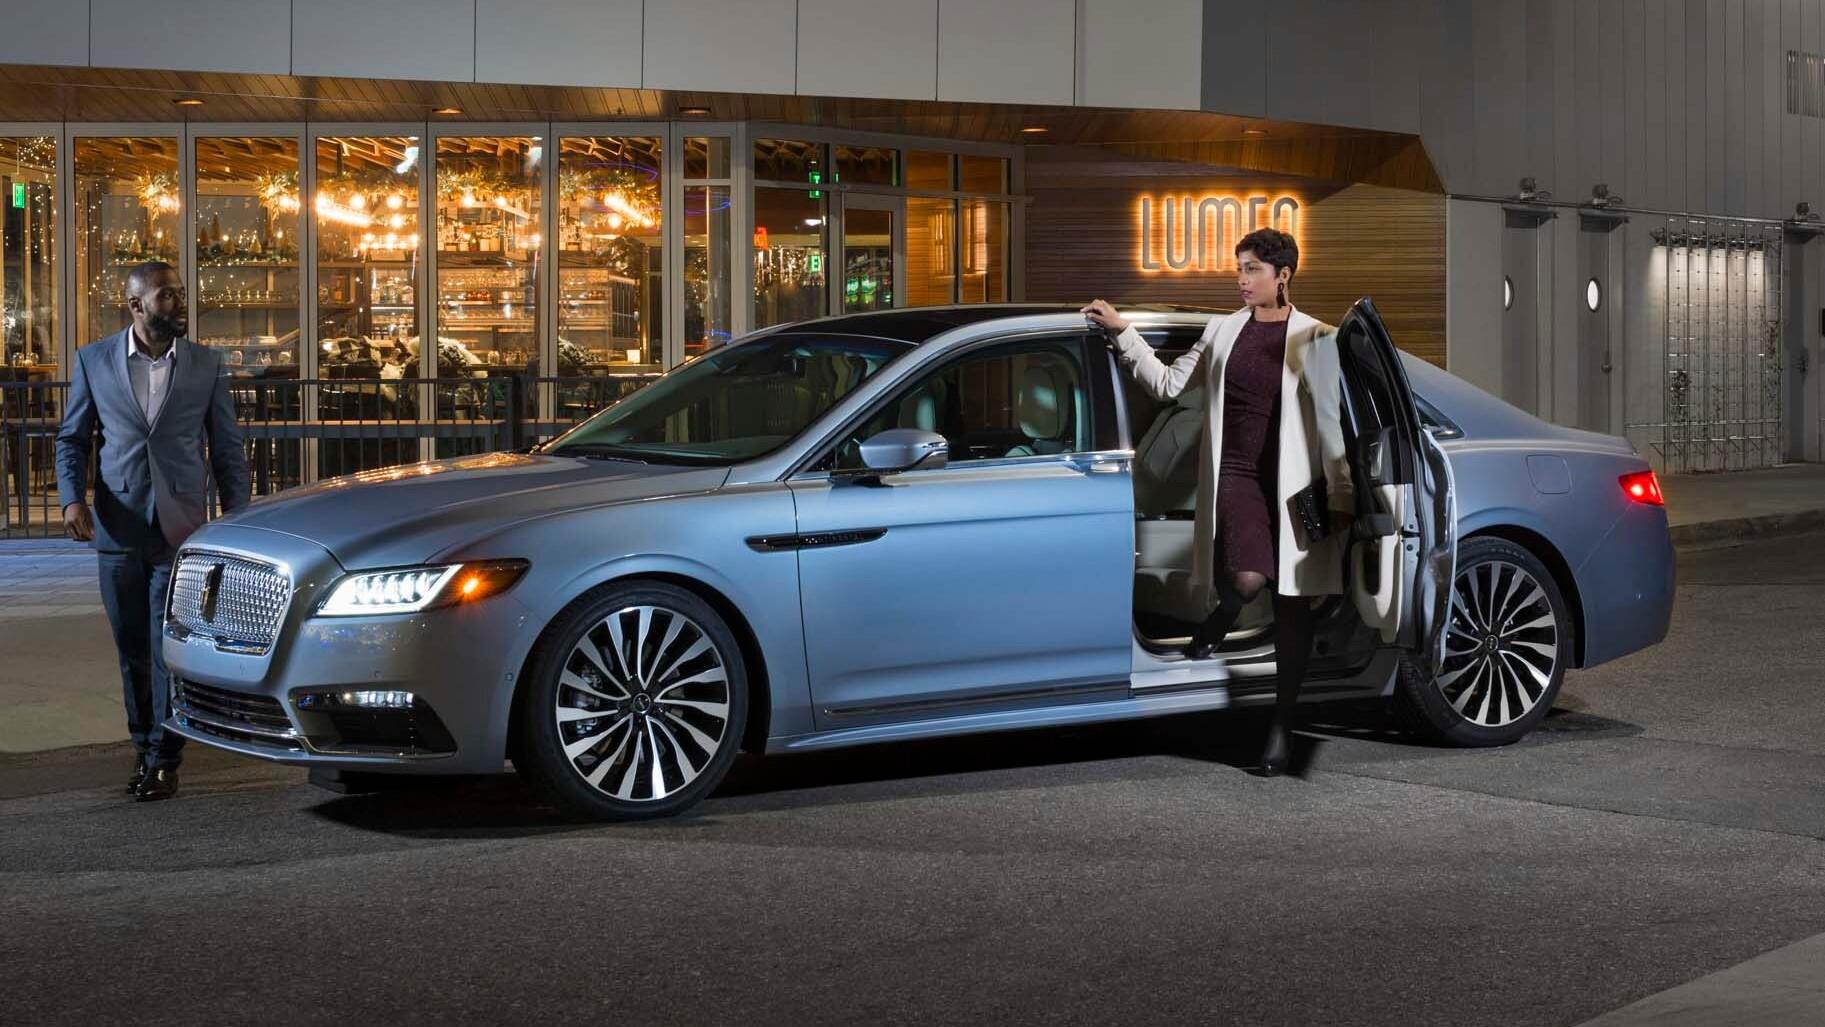 2019 Lincoln Continental Coach Door Edition